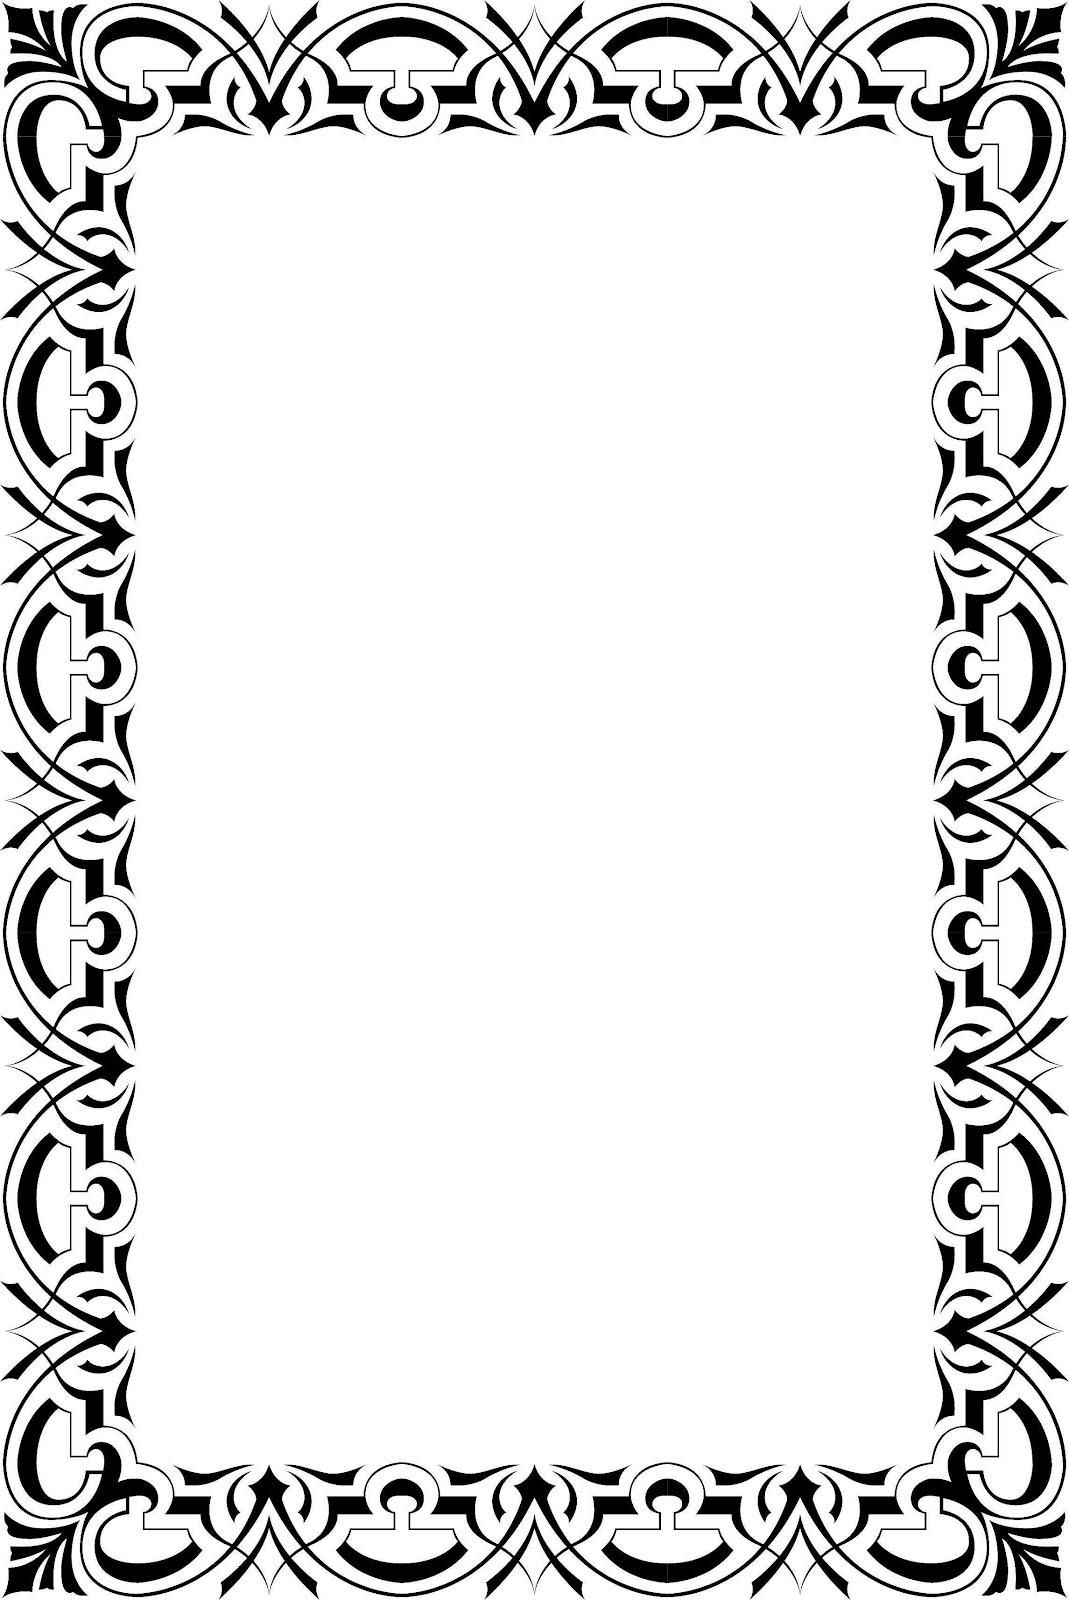 Polka Dot Border